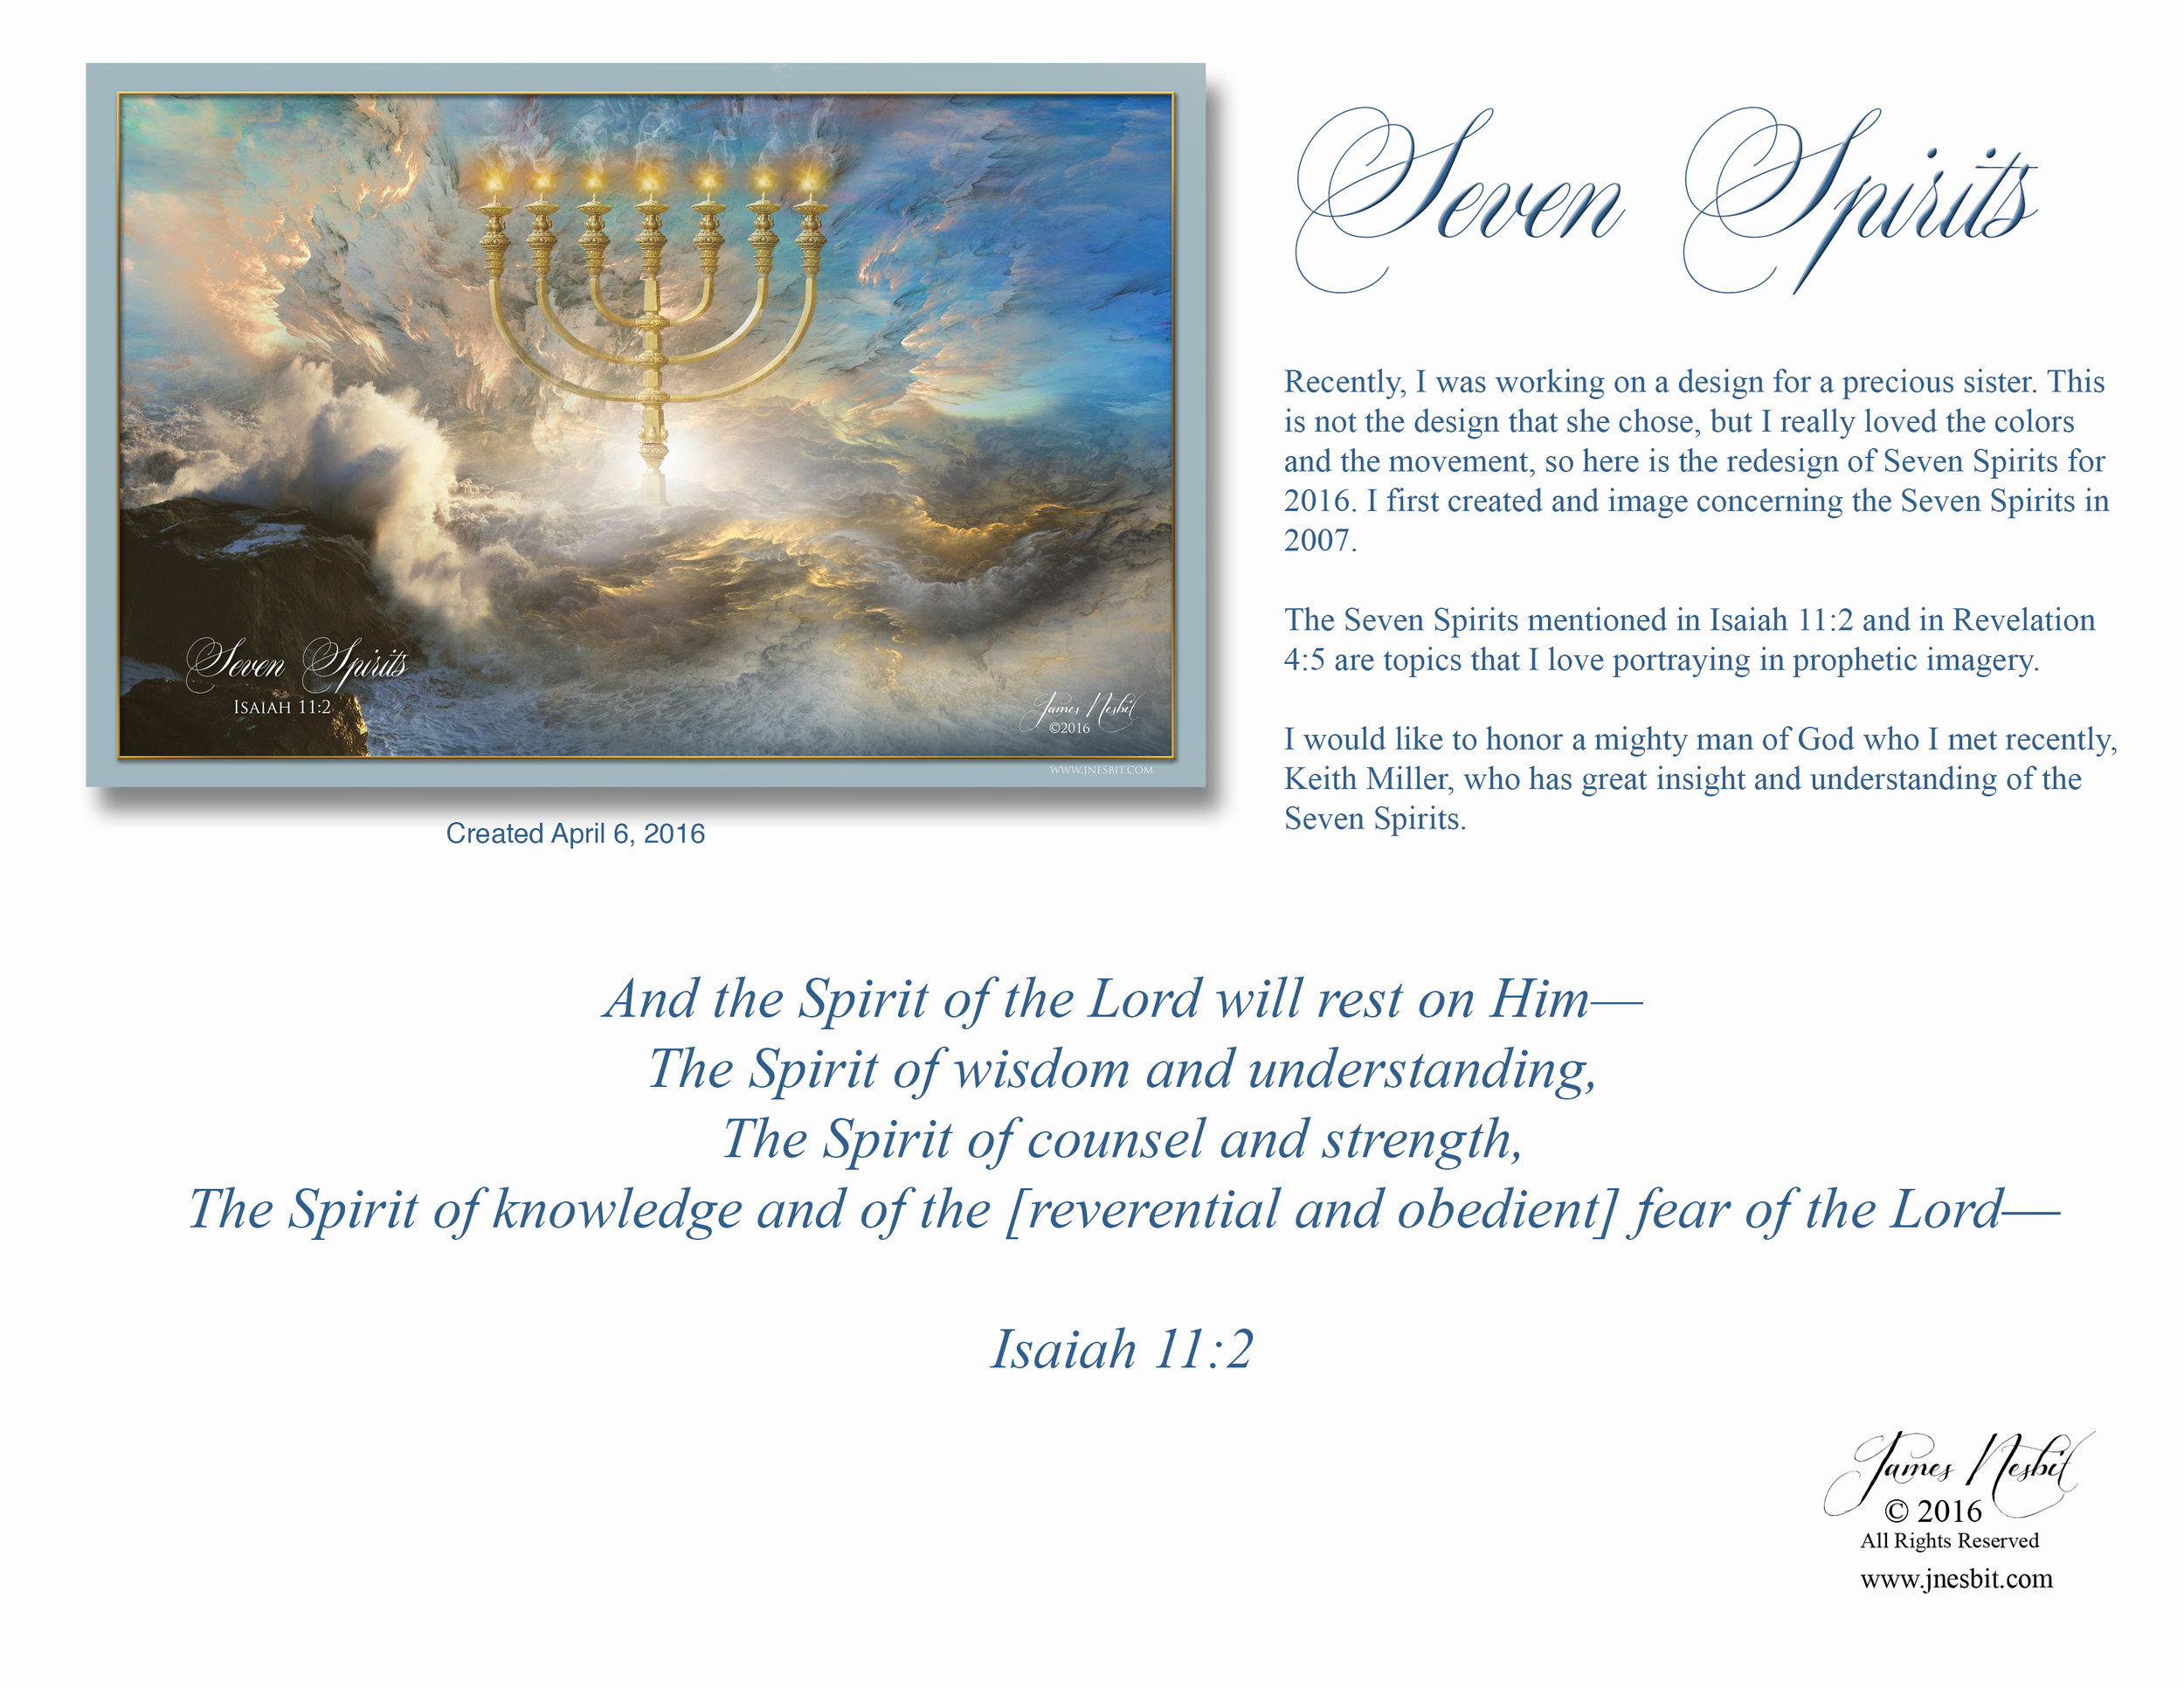 Seven Spirits 2016 Description.jpg